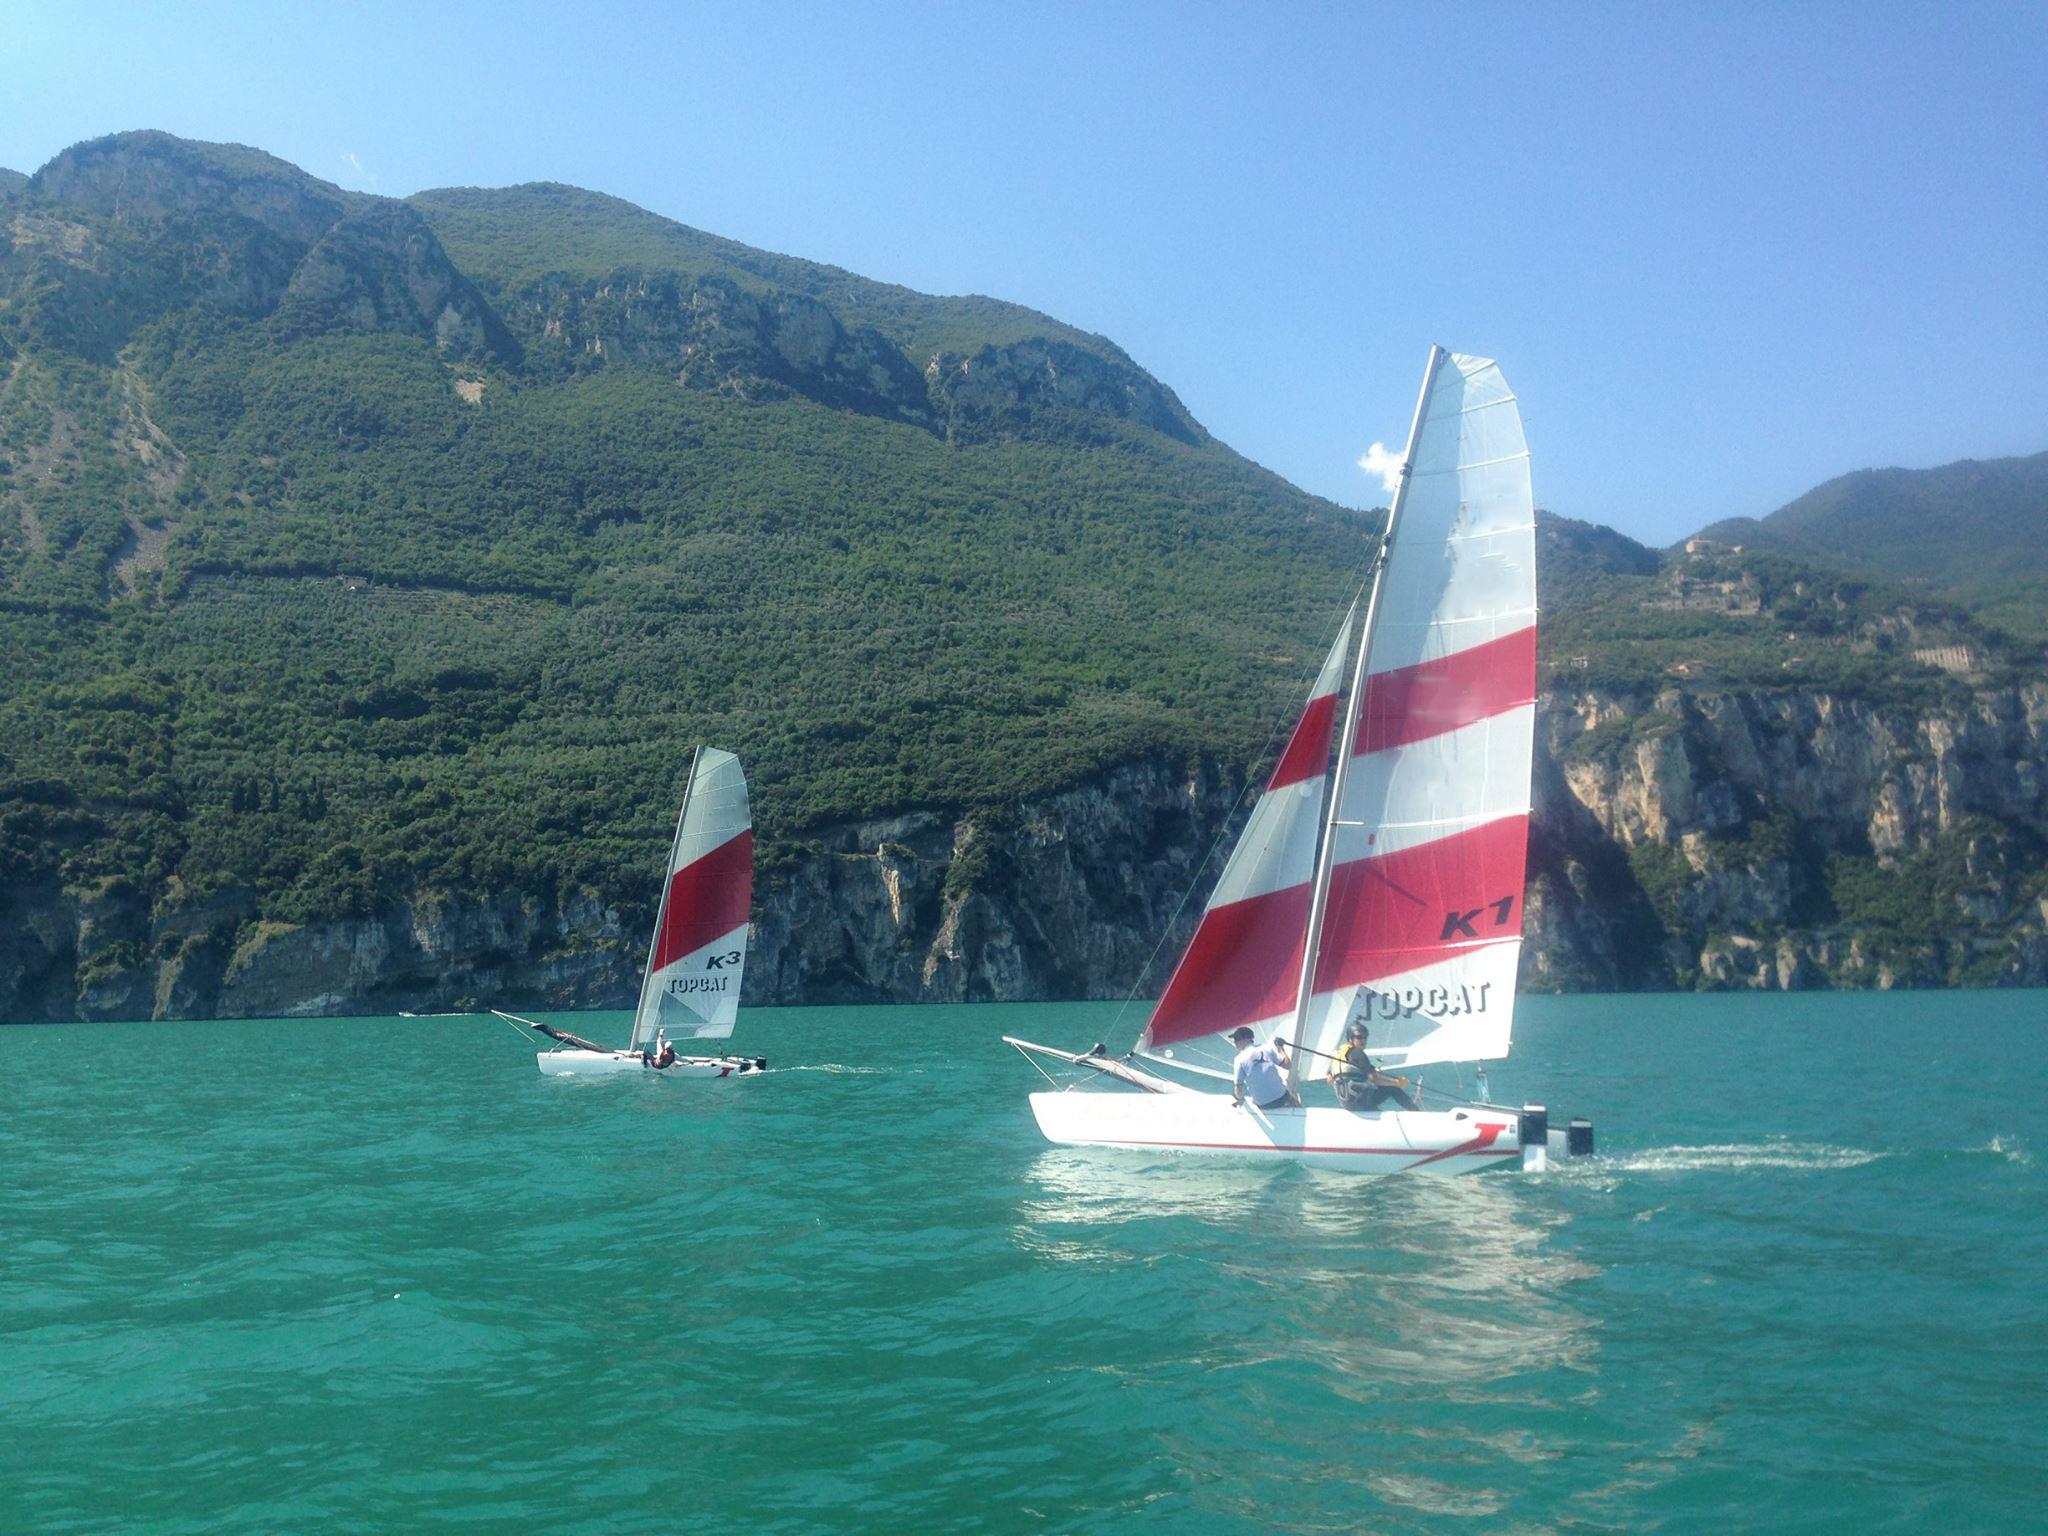 katamaran og jolle sejlads på Gardasøen